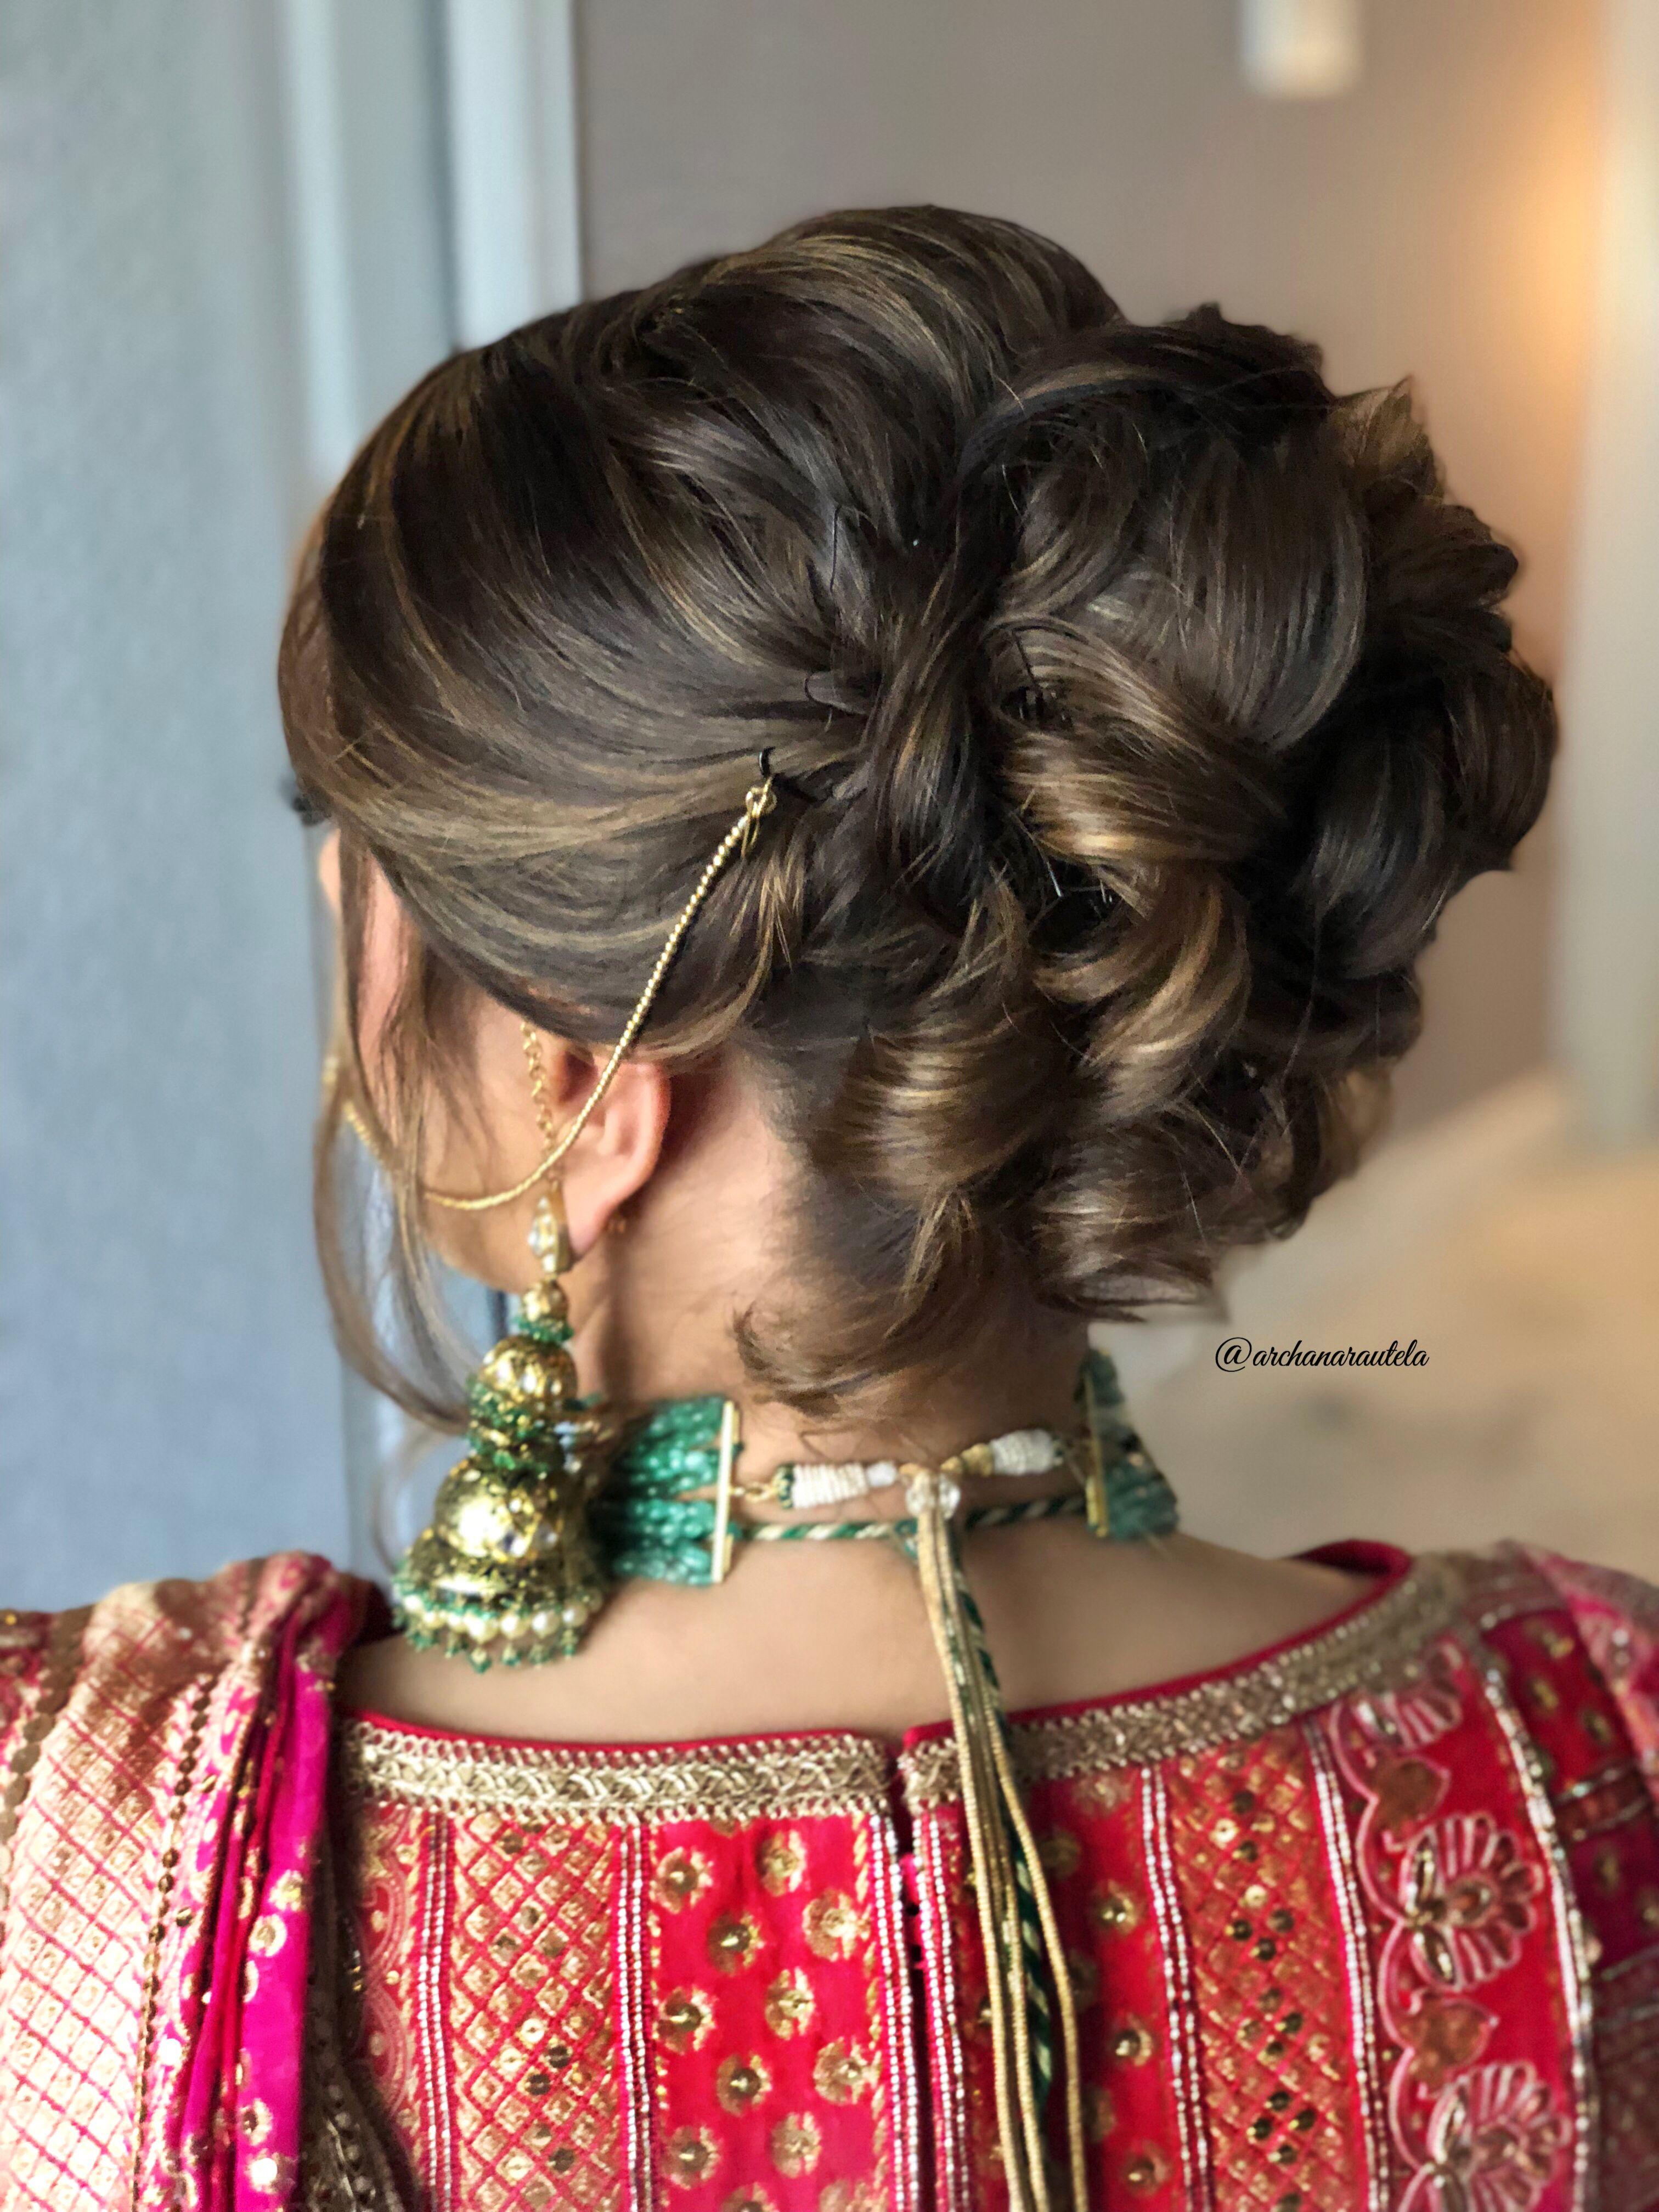 wedding hair goals 💕👰🏼💕soft twisted twirls and curls